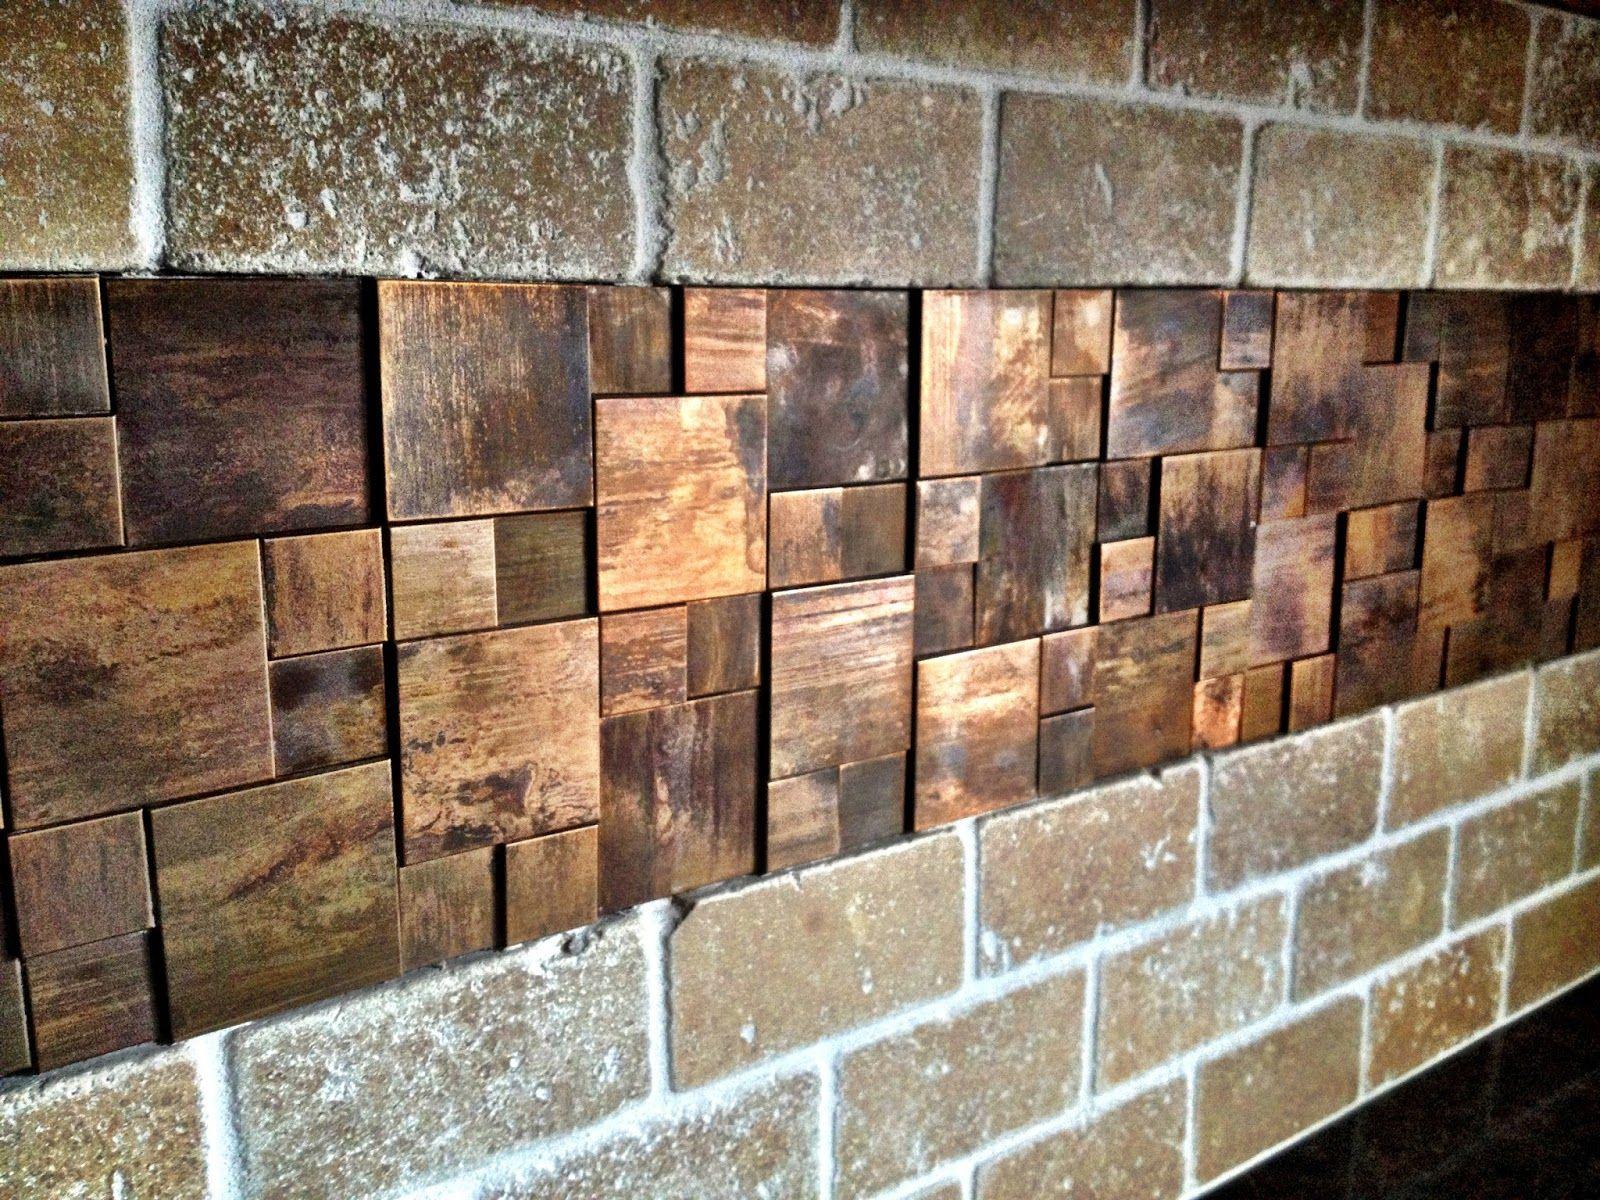 Kitchen Best 25 Copper Backsplash Ideas On Pinterest Reclaimed Wood 96af3fed03d9a048f5350d3199d Kit Metallic Backsplash Copper Backsplash Metal Tile Backsplash